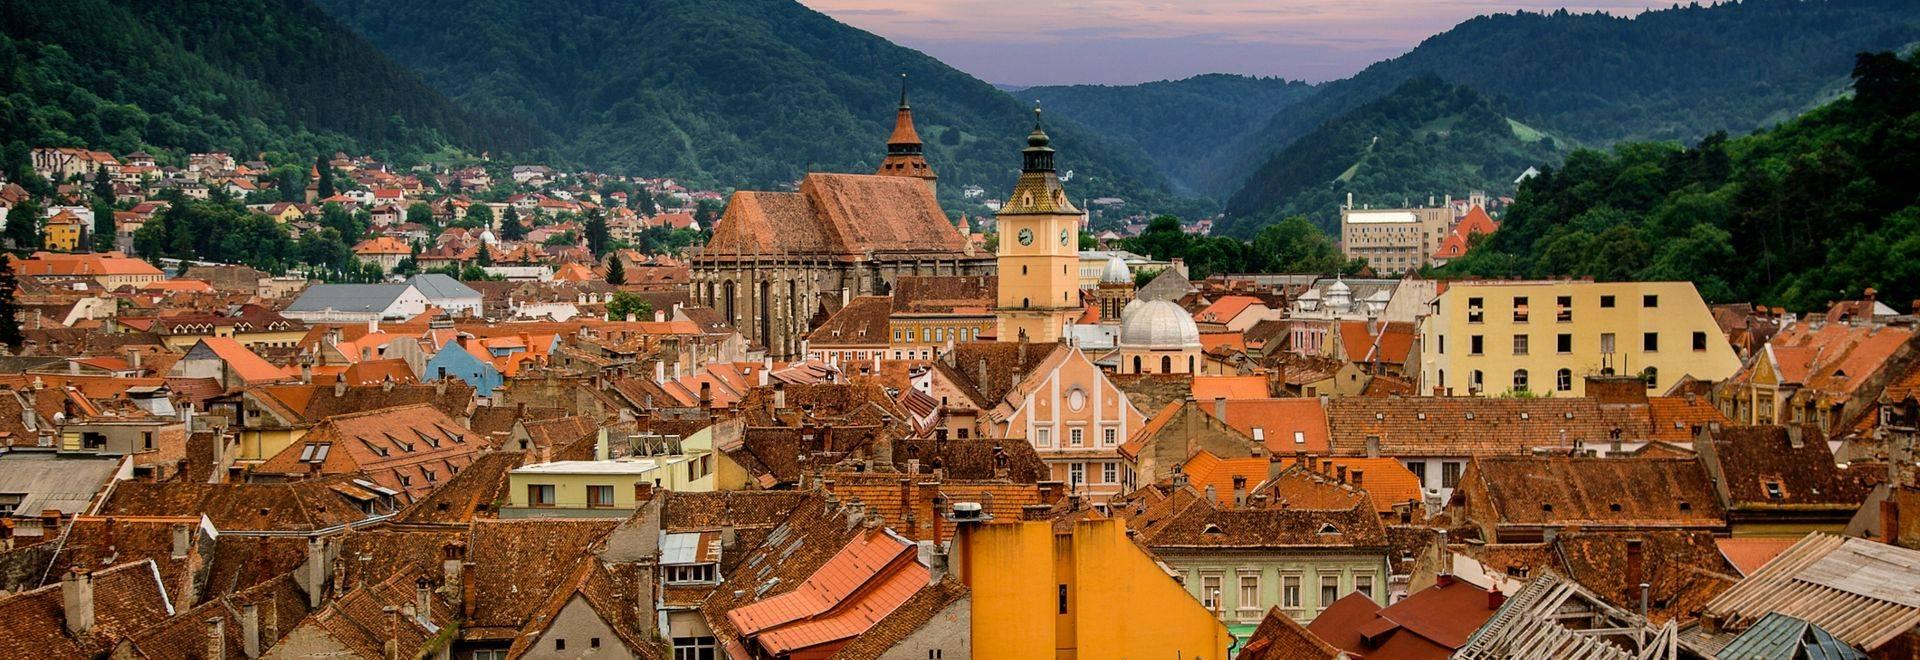 GettyImages-1174461694 City skyline and Tampa Mountains, Brasov, Transylvania, Romania.jpg